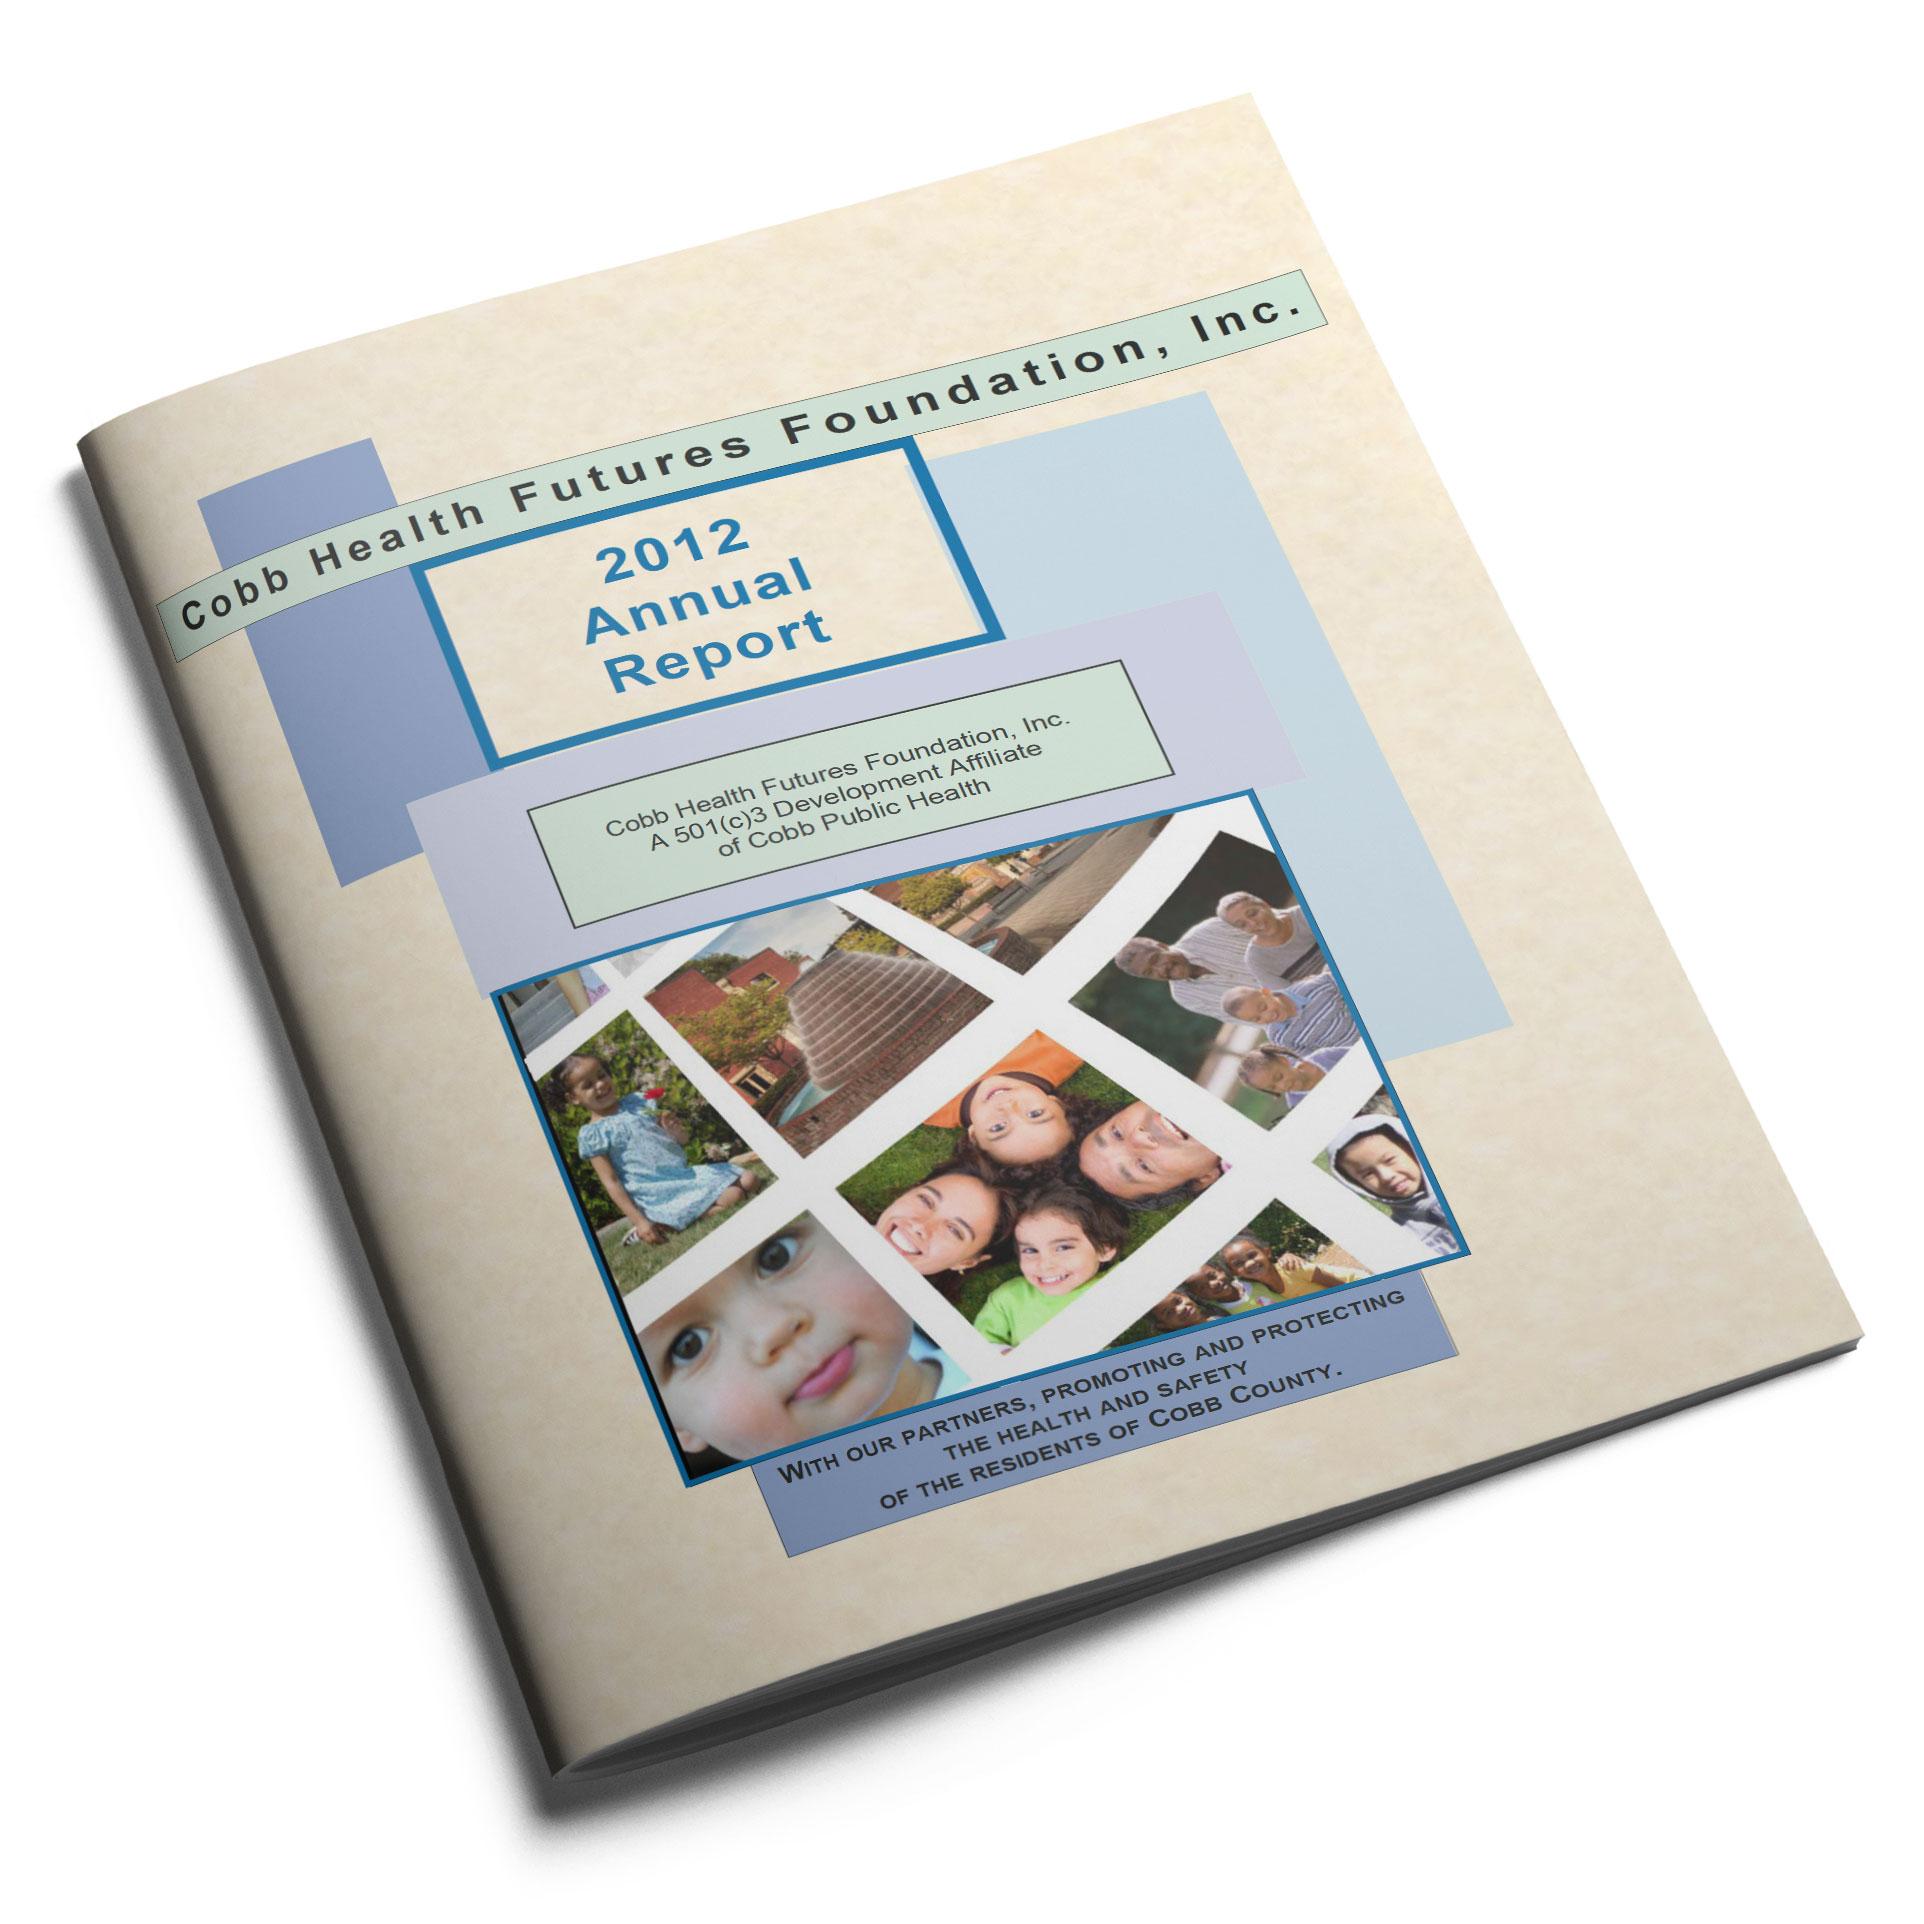 CHFF-2012-Annual-Report